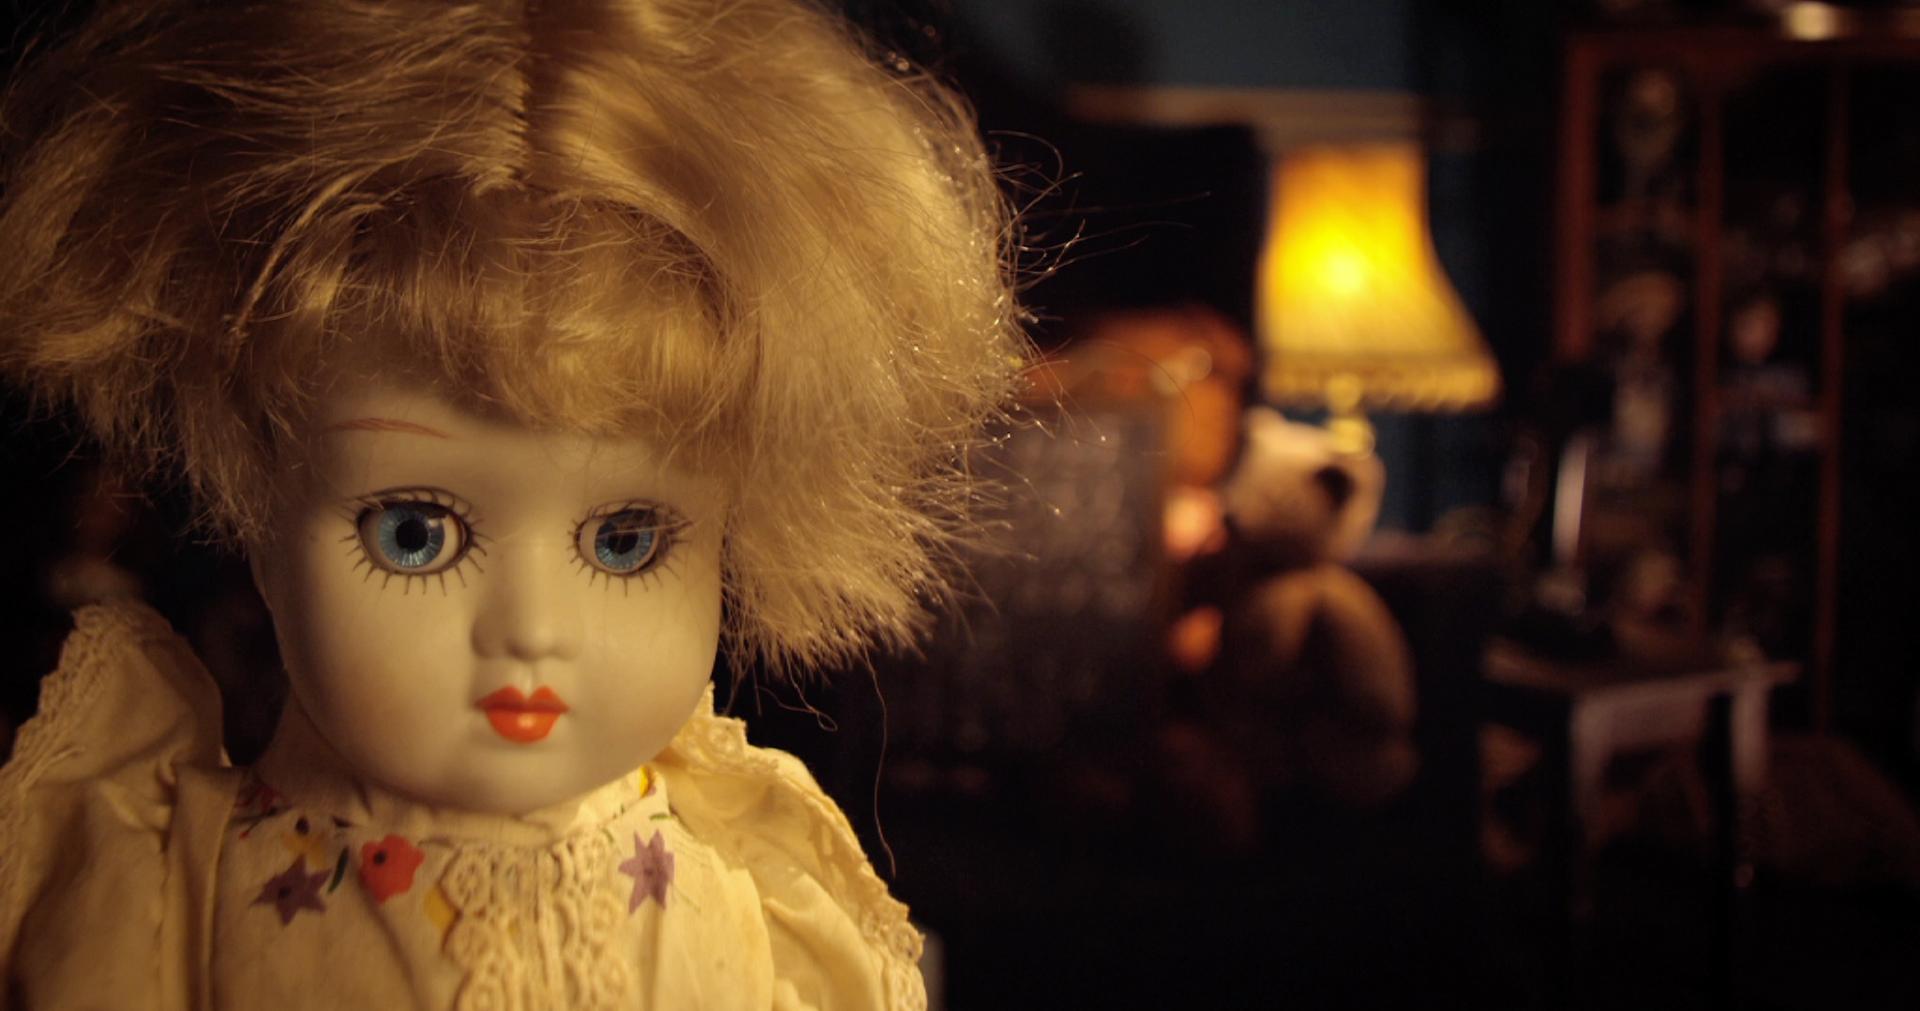 Dolls (2013)   UK   4 mins   Colour   5.1   RED   Cooke S4s & Century Swing Swift